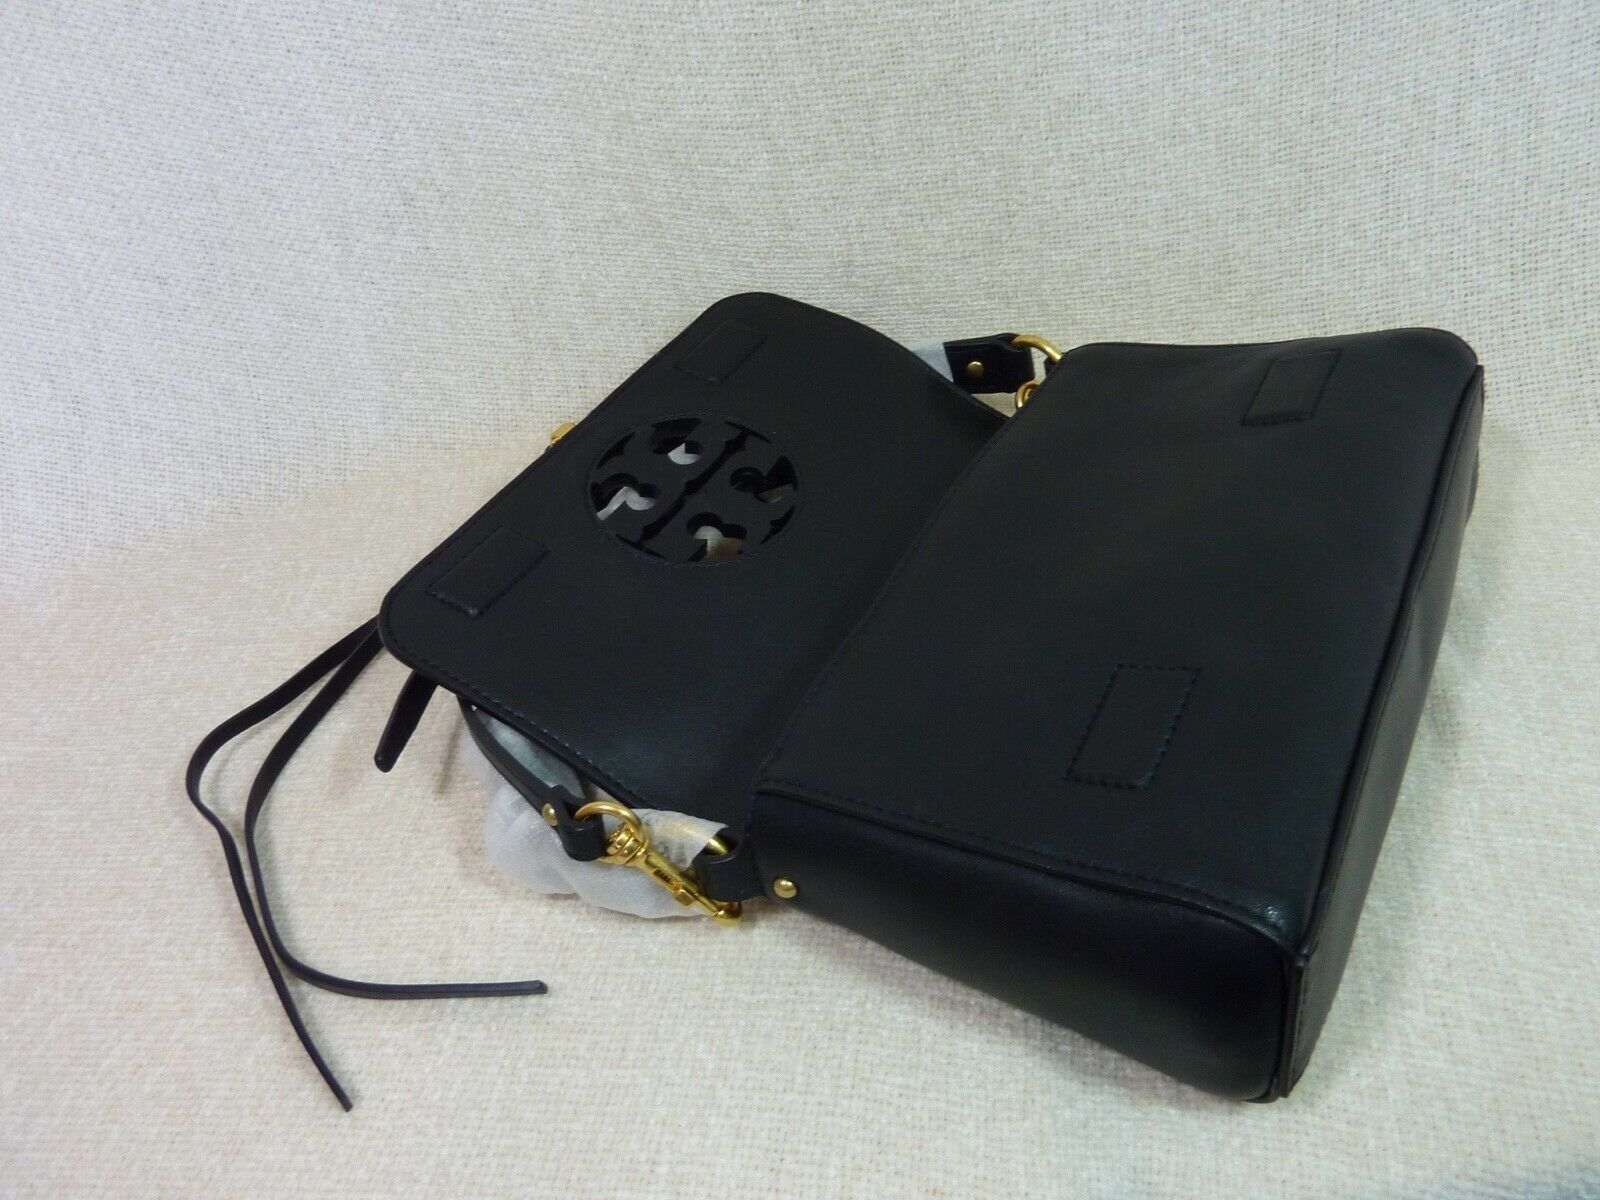 NWT Tory Burch Black Leather Miller Metal Cross-Body Bag/Mini Shoulder Bag $398 image 7